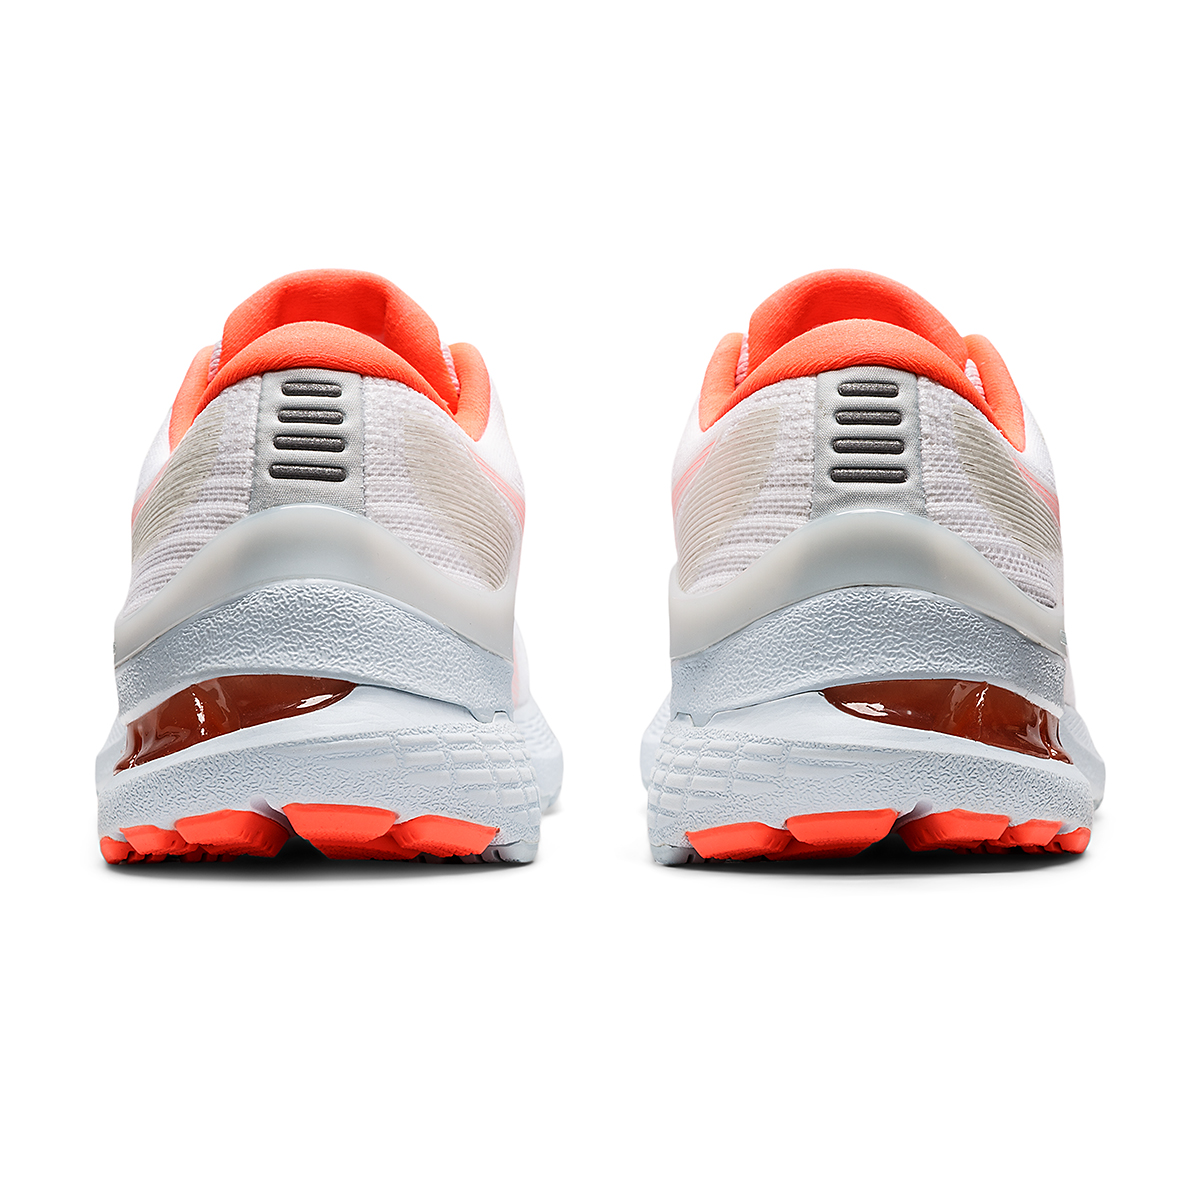 Women's Asics Gel-Kayano 28 Running Shoe - Color: White/Flash Coral - JackRabbit Exclusive - Size: 5 - Width: Regular, White/Flash Coral - JackRabbit Exclusive, large, image 5